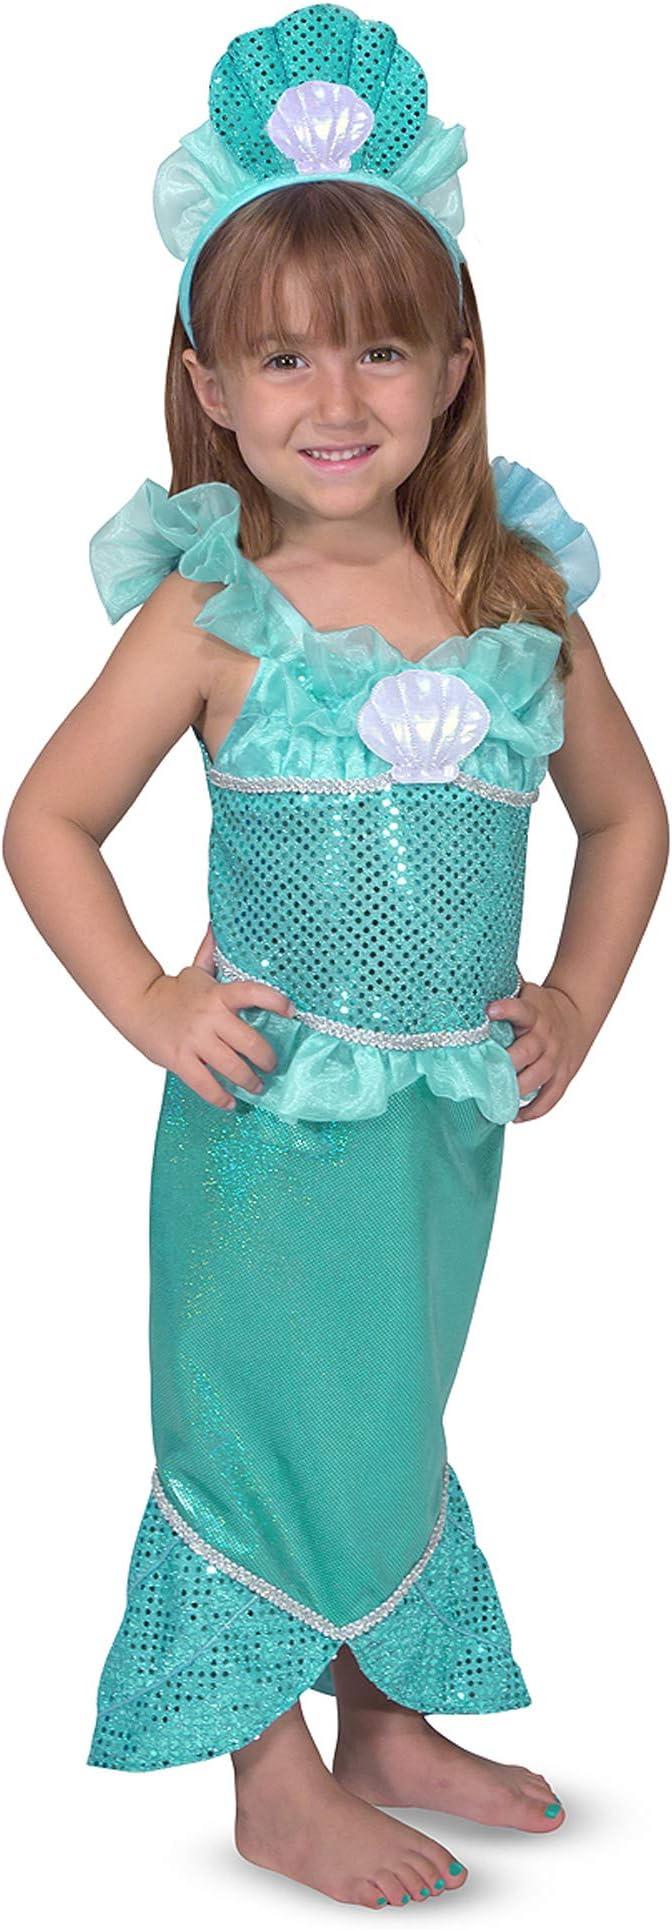 pretend play Seashell crown dress up